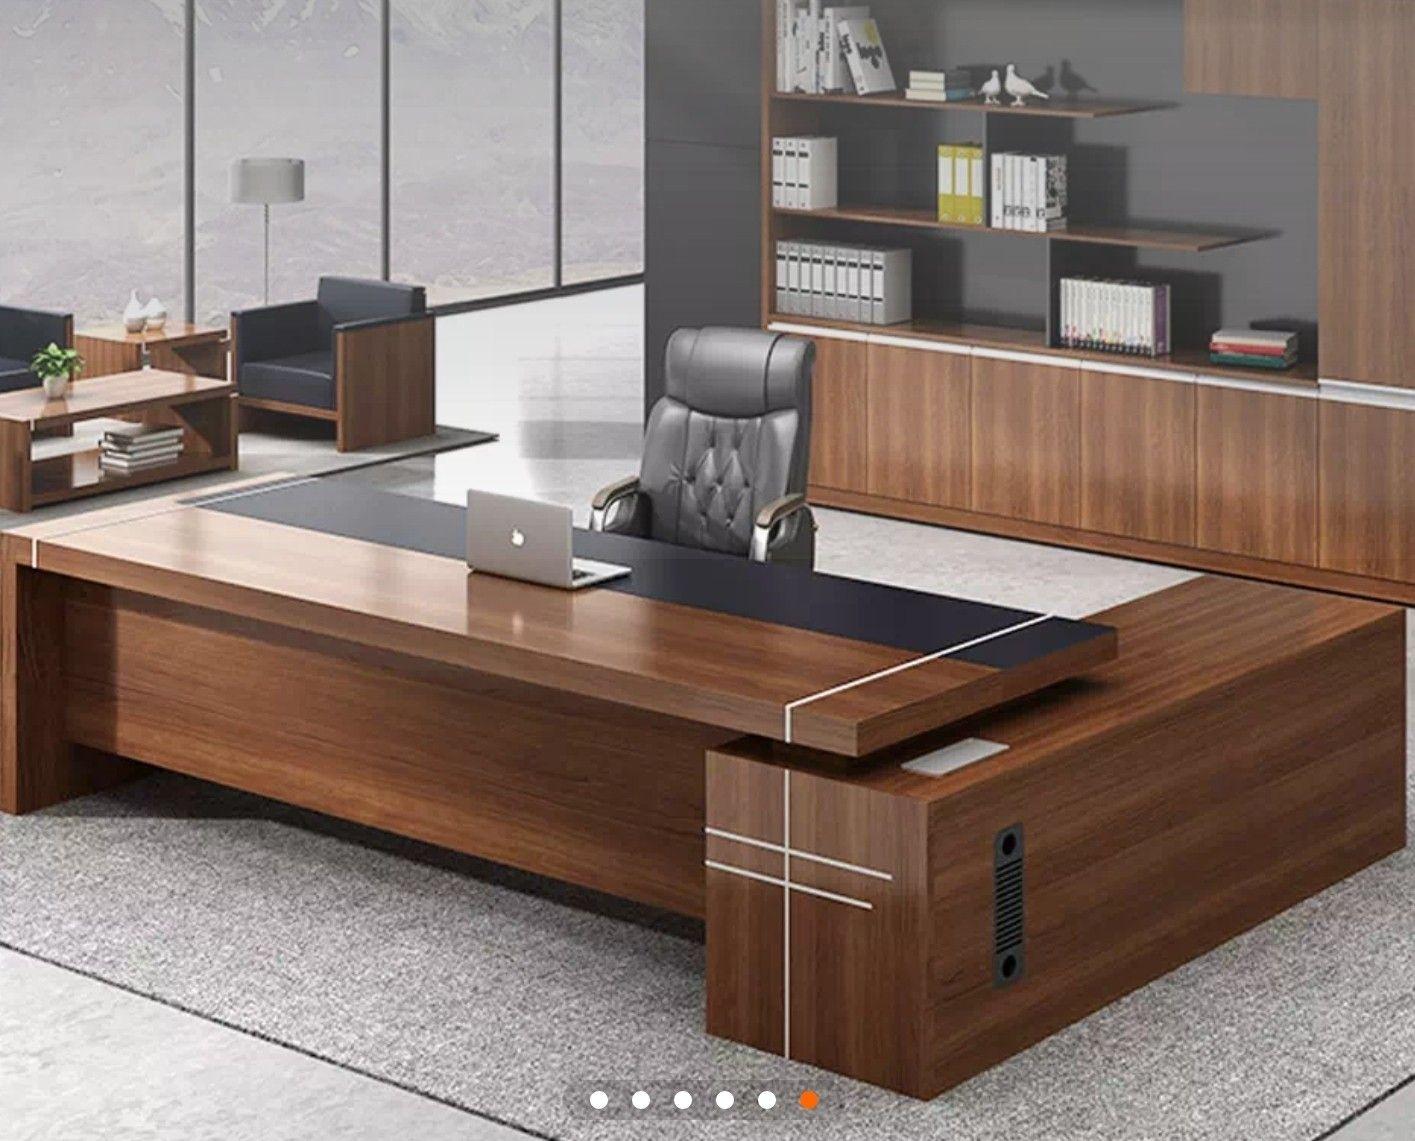 Fabulous Pin By Hazem Abo El Khair On Mkatb Styl Steel Wood Office In Download Free Architecture Designs Grimeyleaguecom